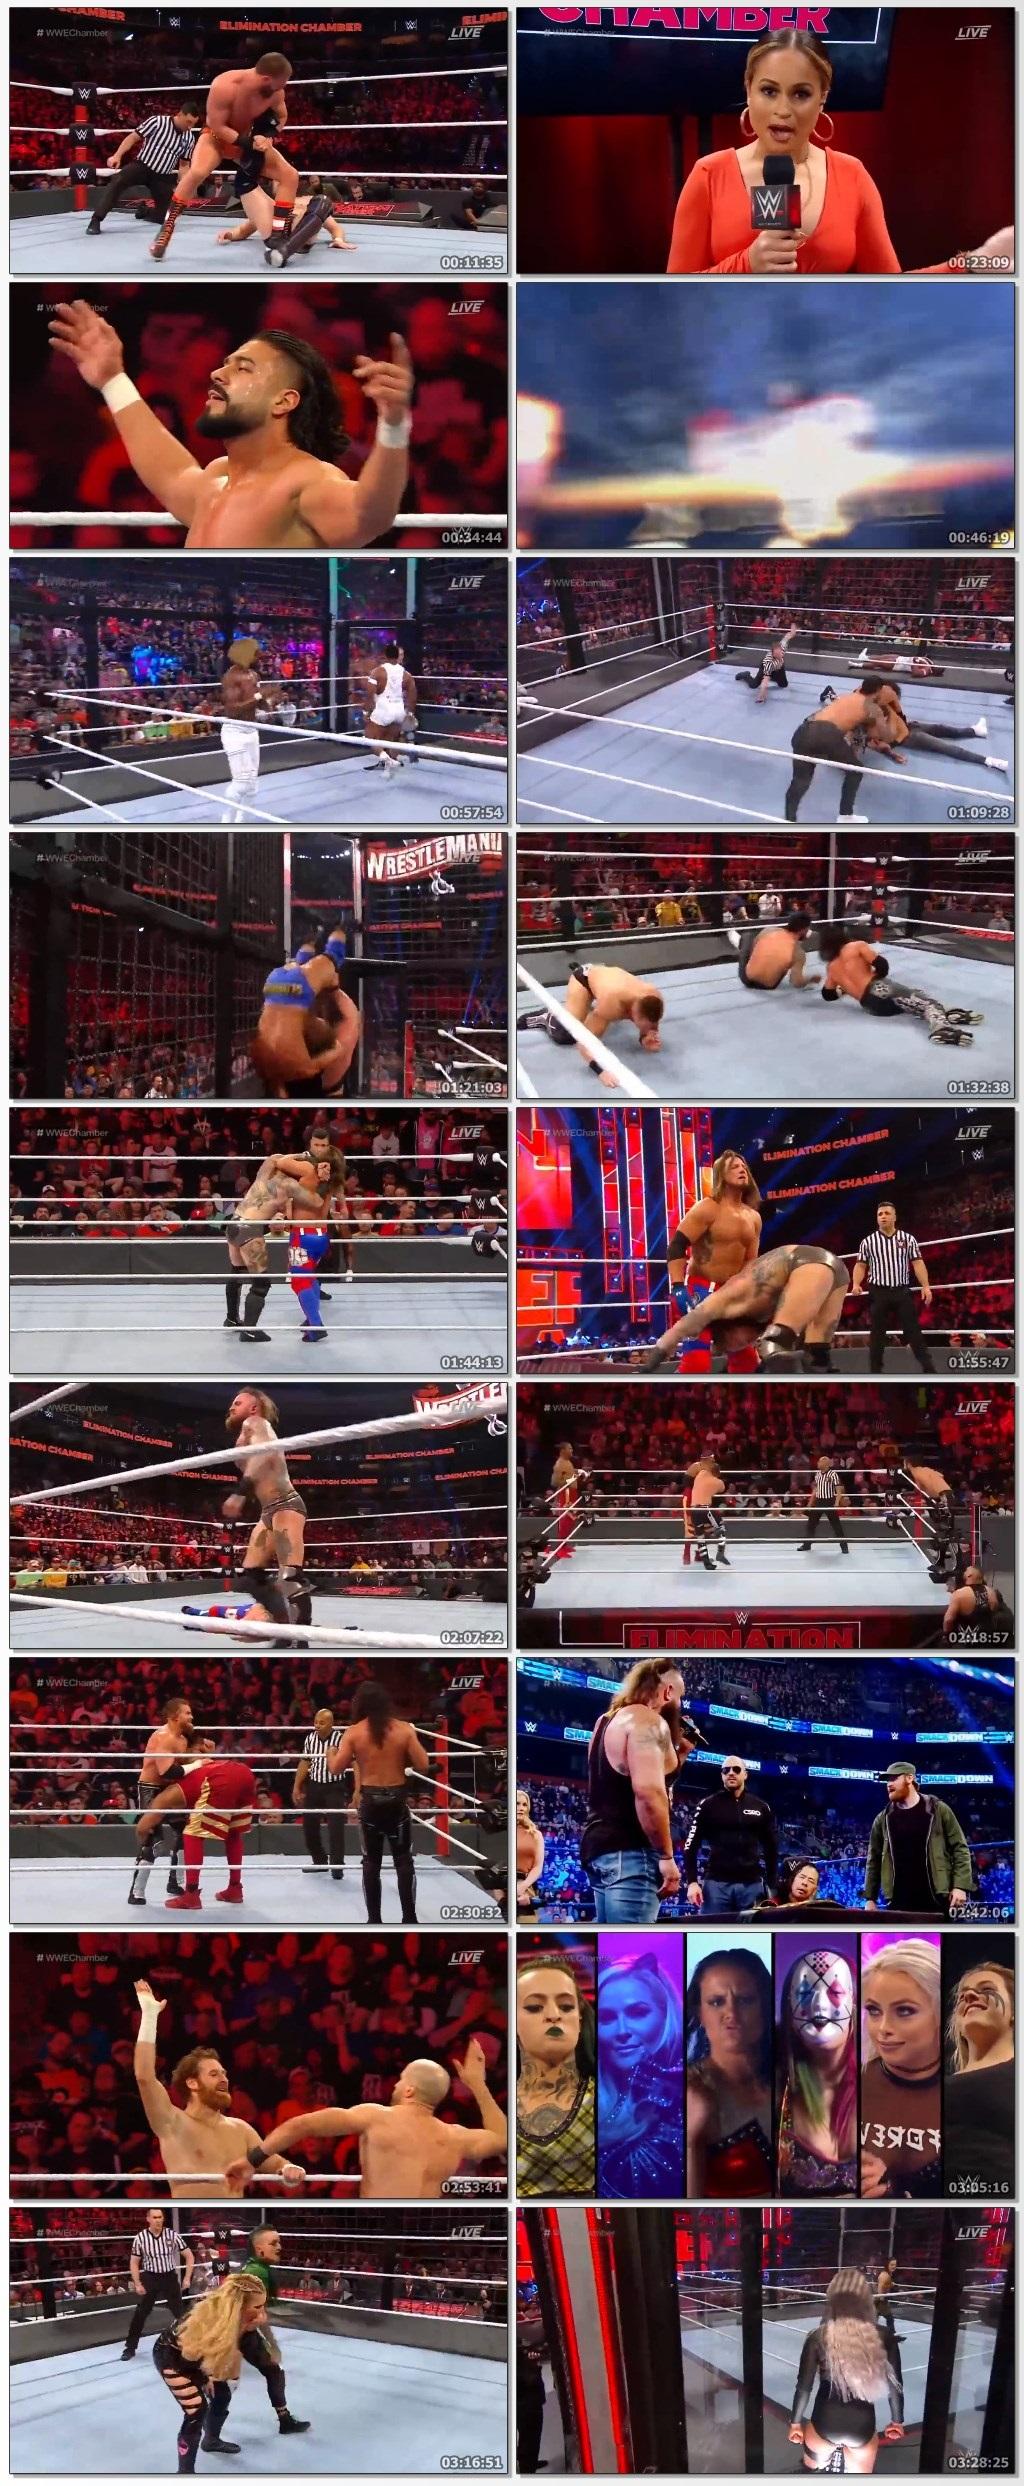 WWE-Elimination-Chamber-2020-mkv-thumbs